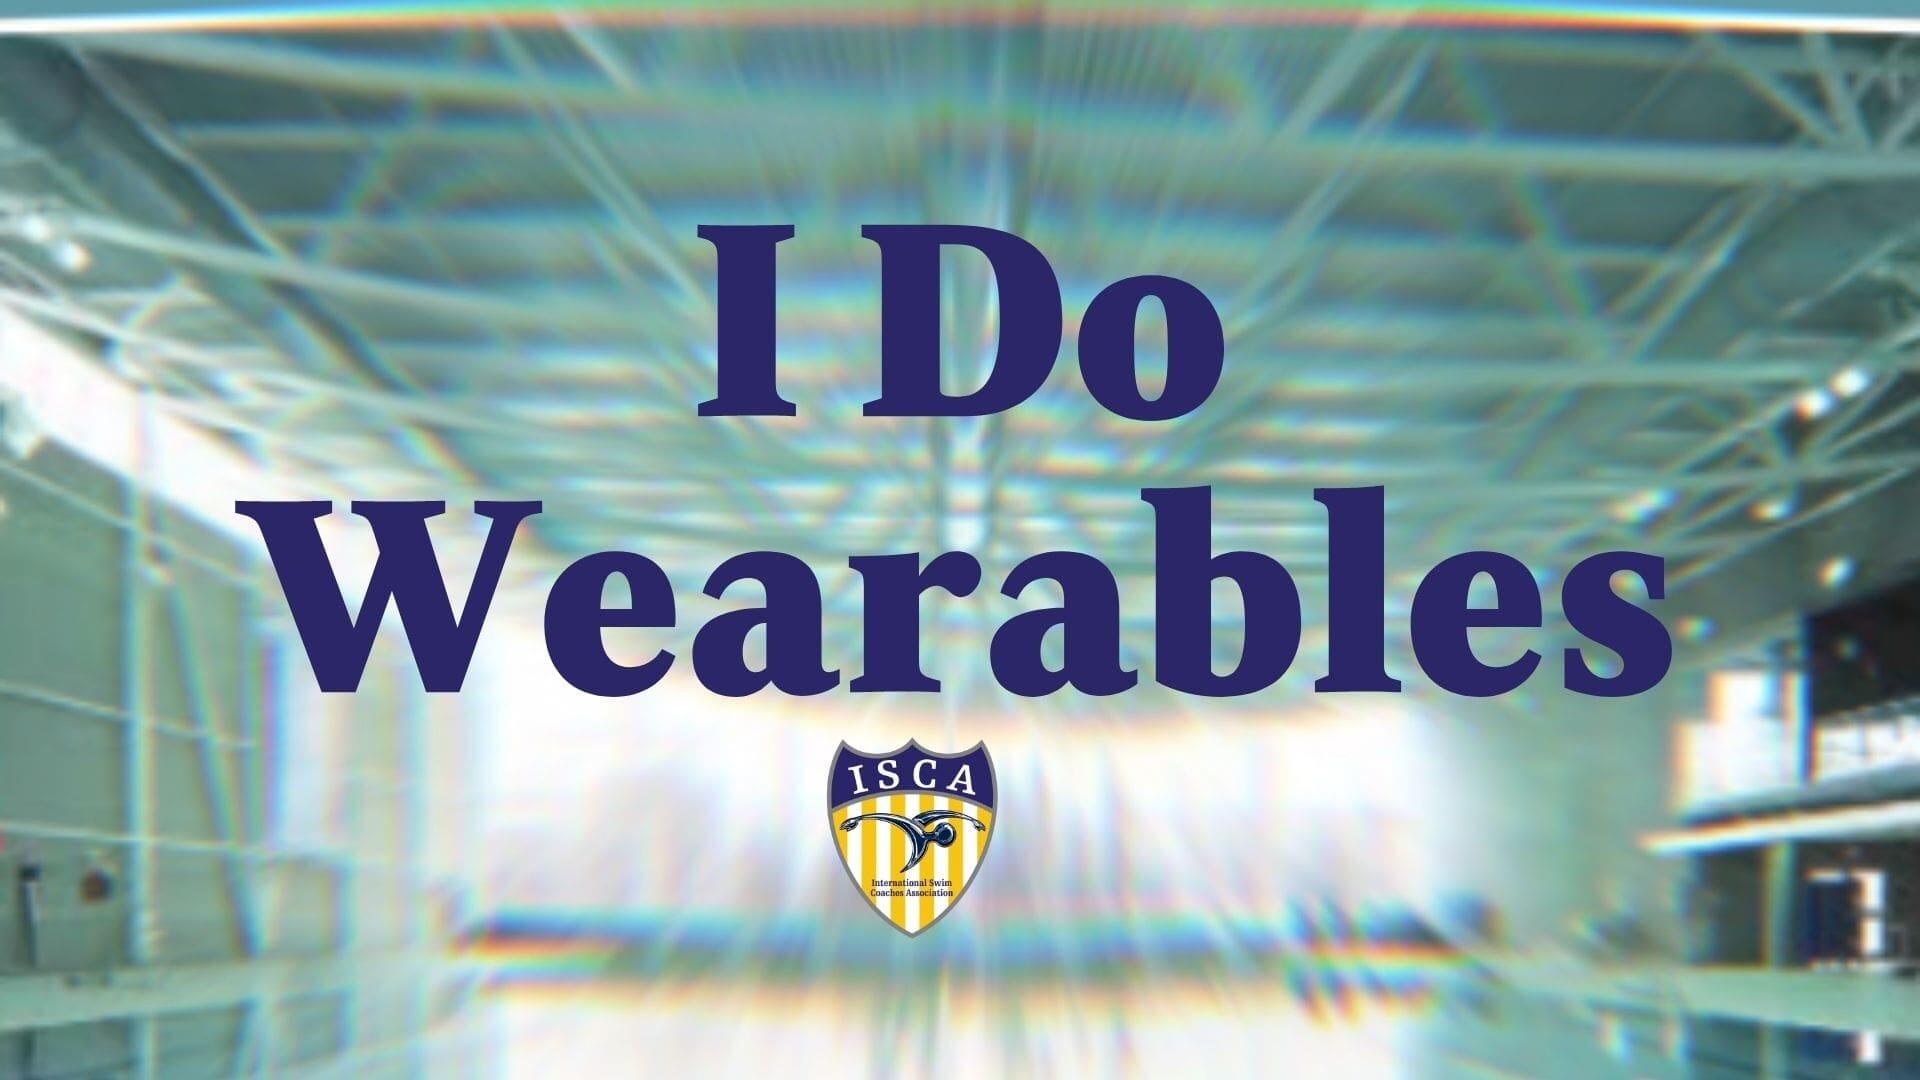 I Do Wearables